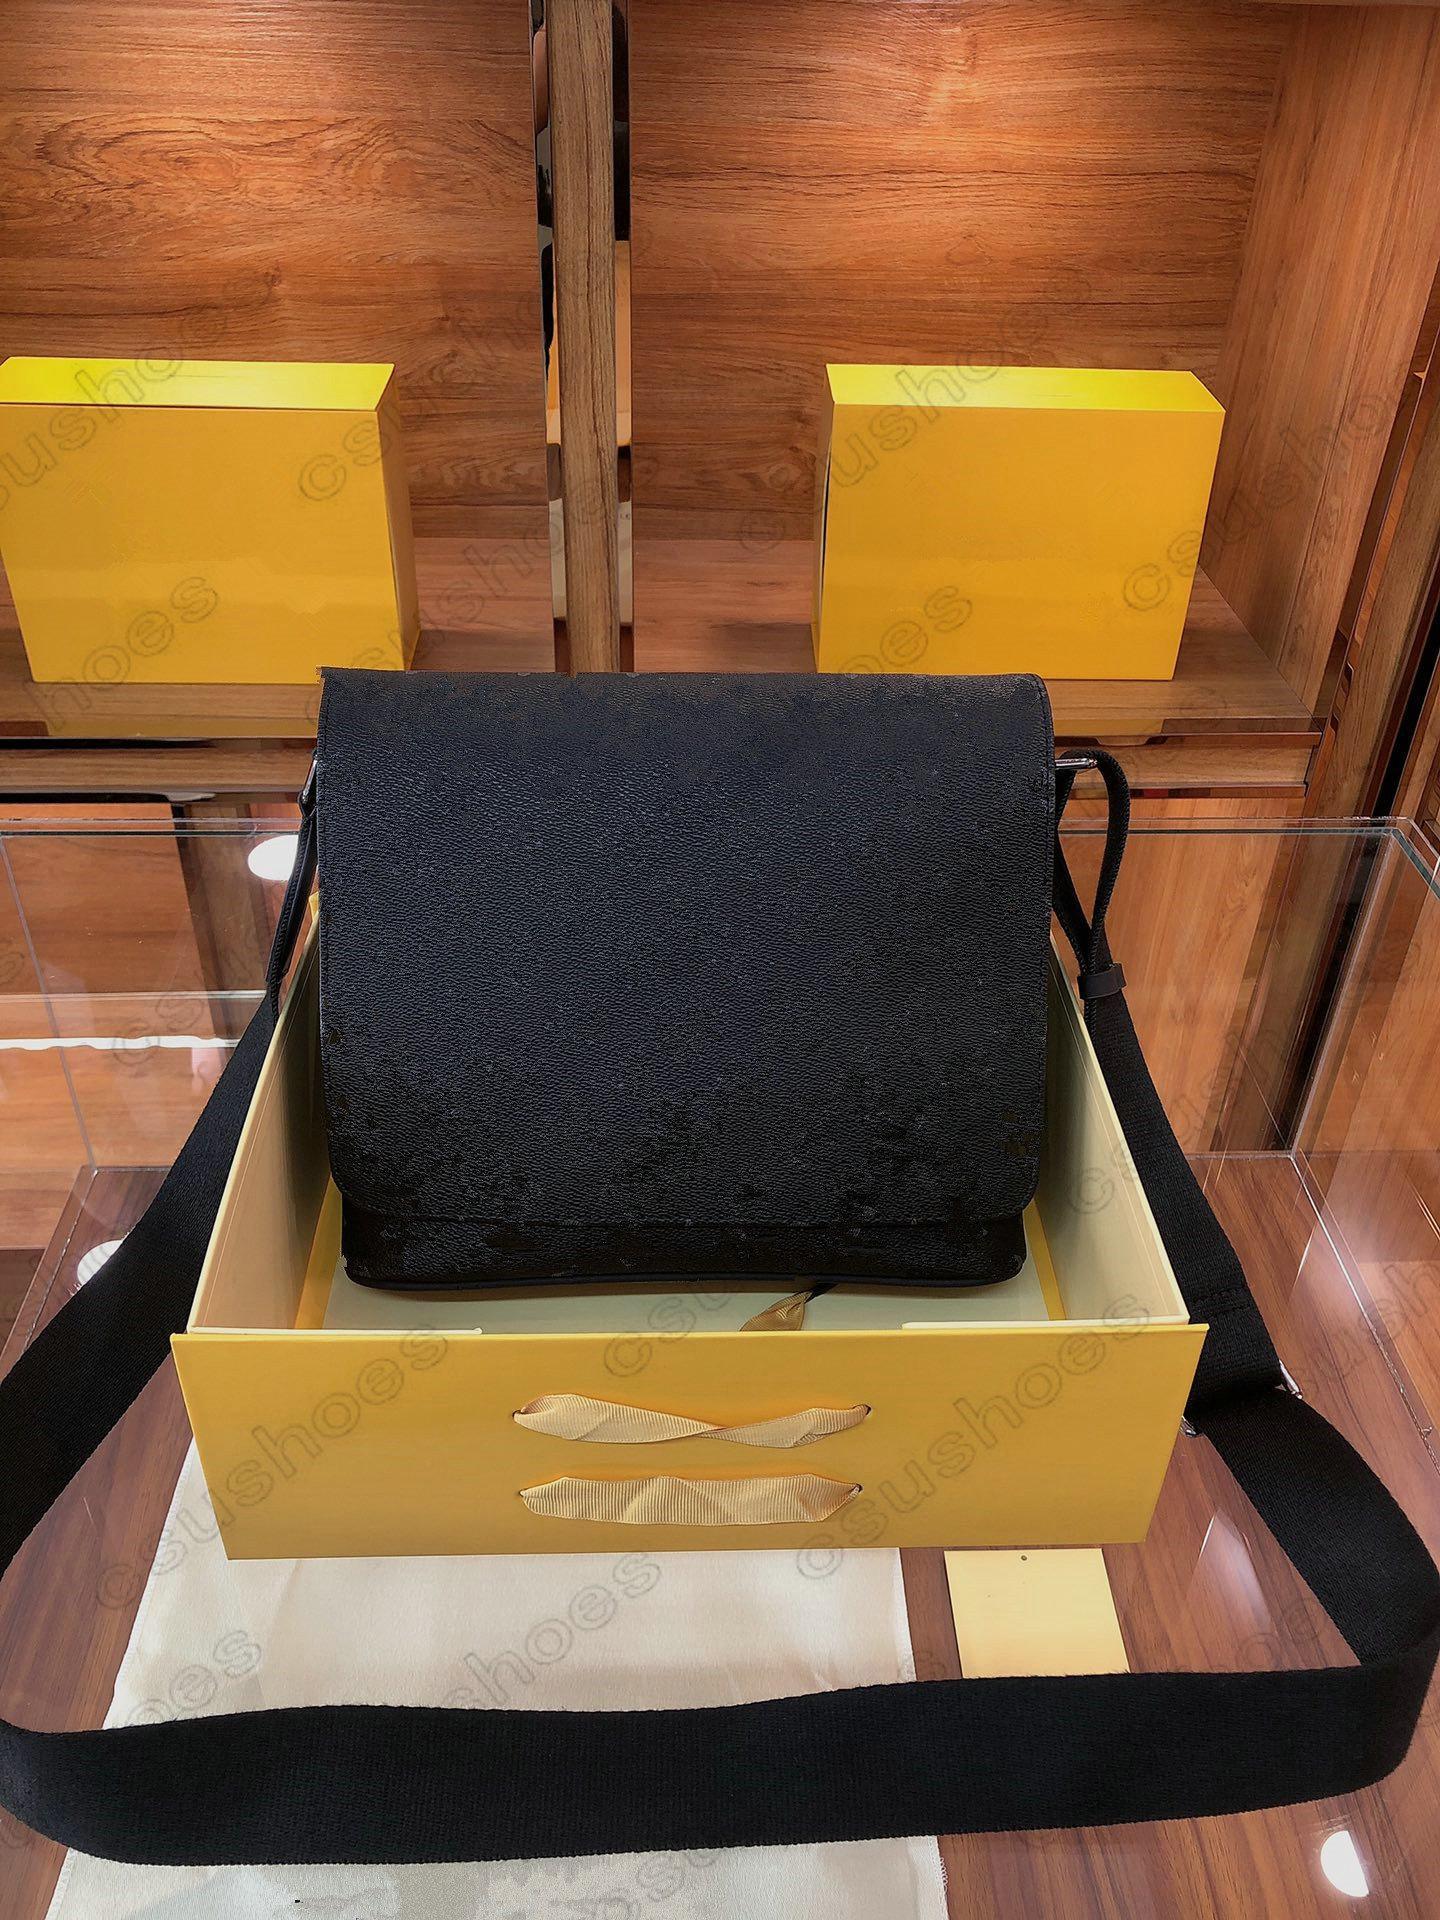 Distrikt PM Monogramme Eclipse Black Coated Canvas Messenger Bag Hobo Schulter Geldbörsen Totes Designer Luxurys Herrenhandtasche